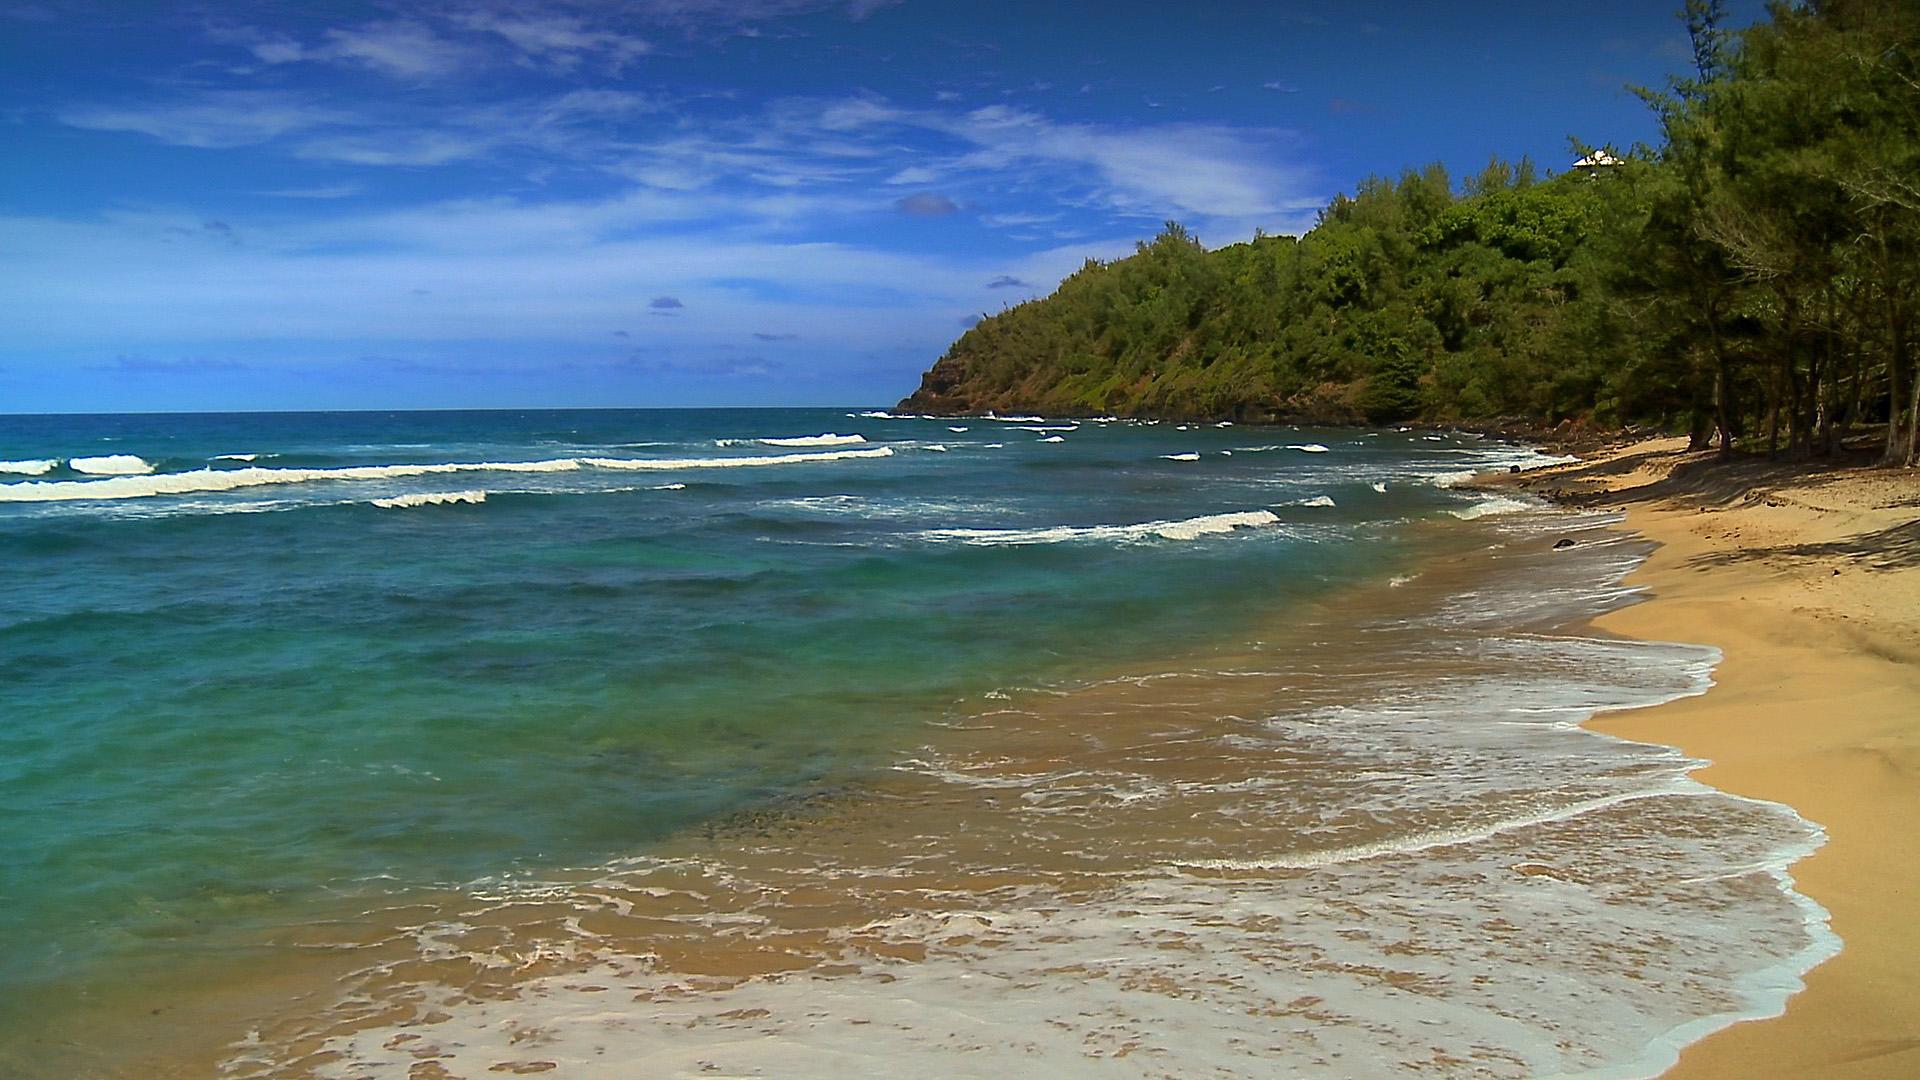 Hawaii Beaches wallpaper 59541